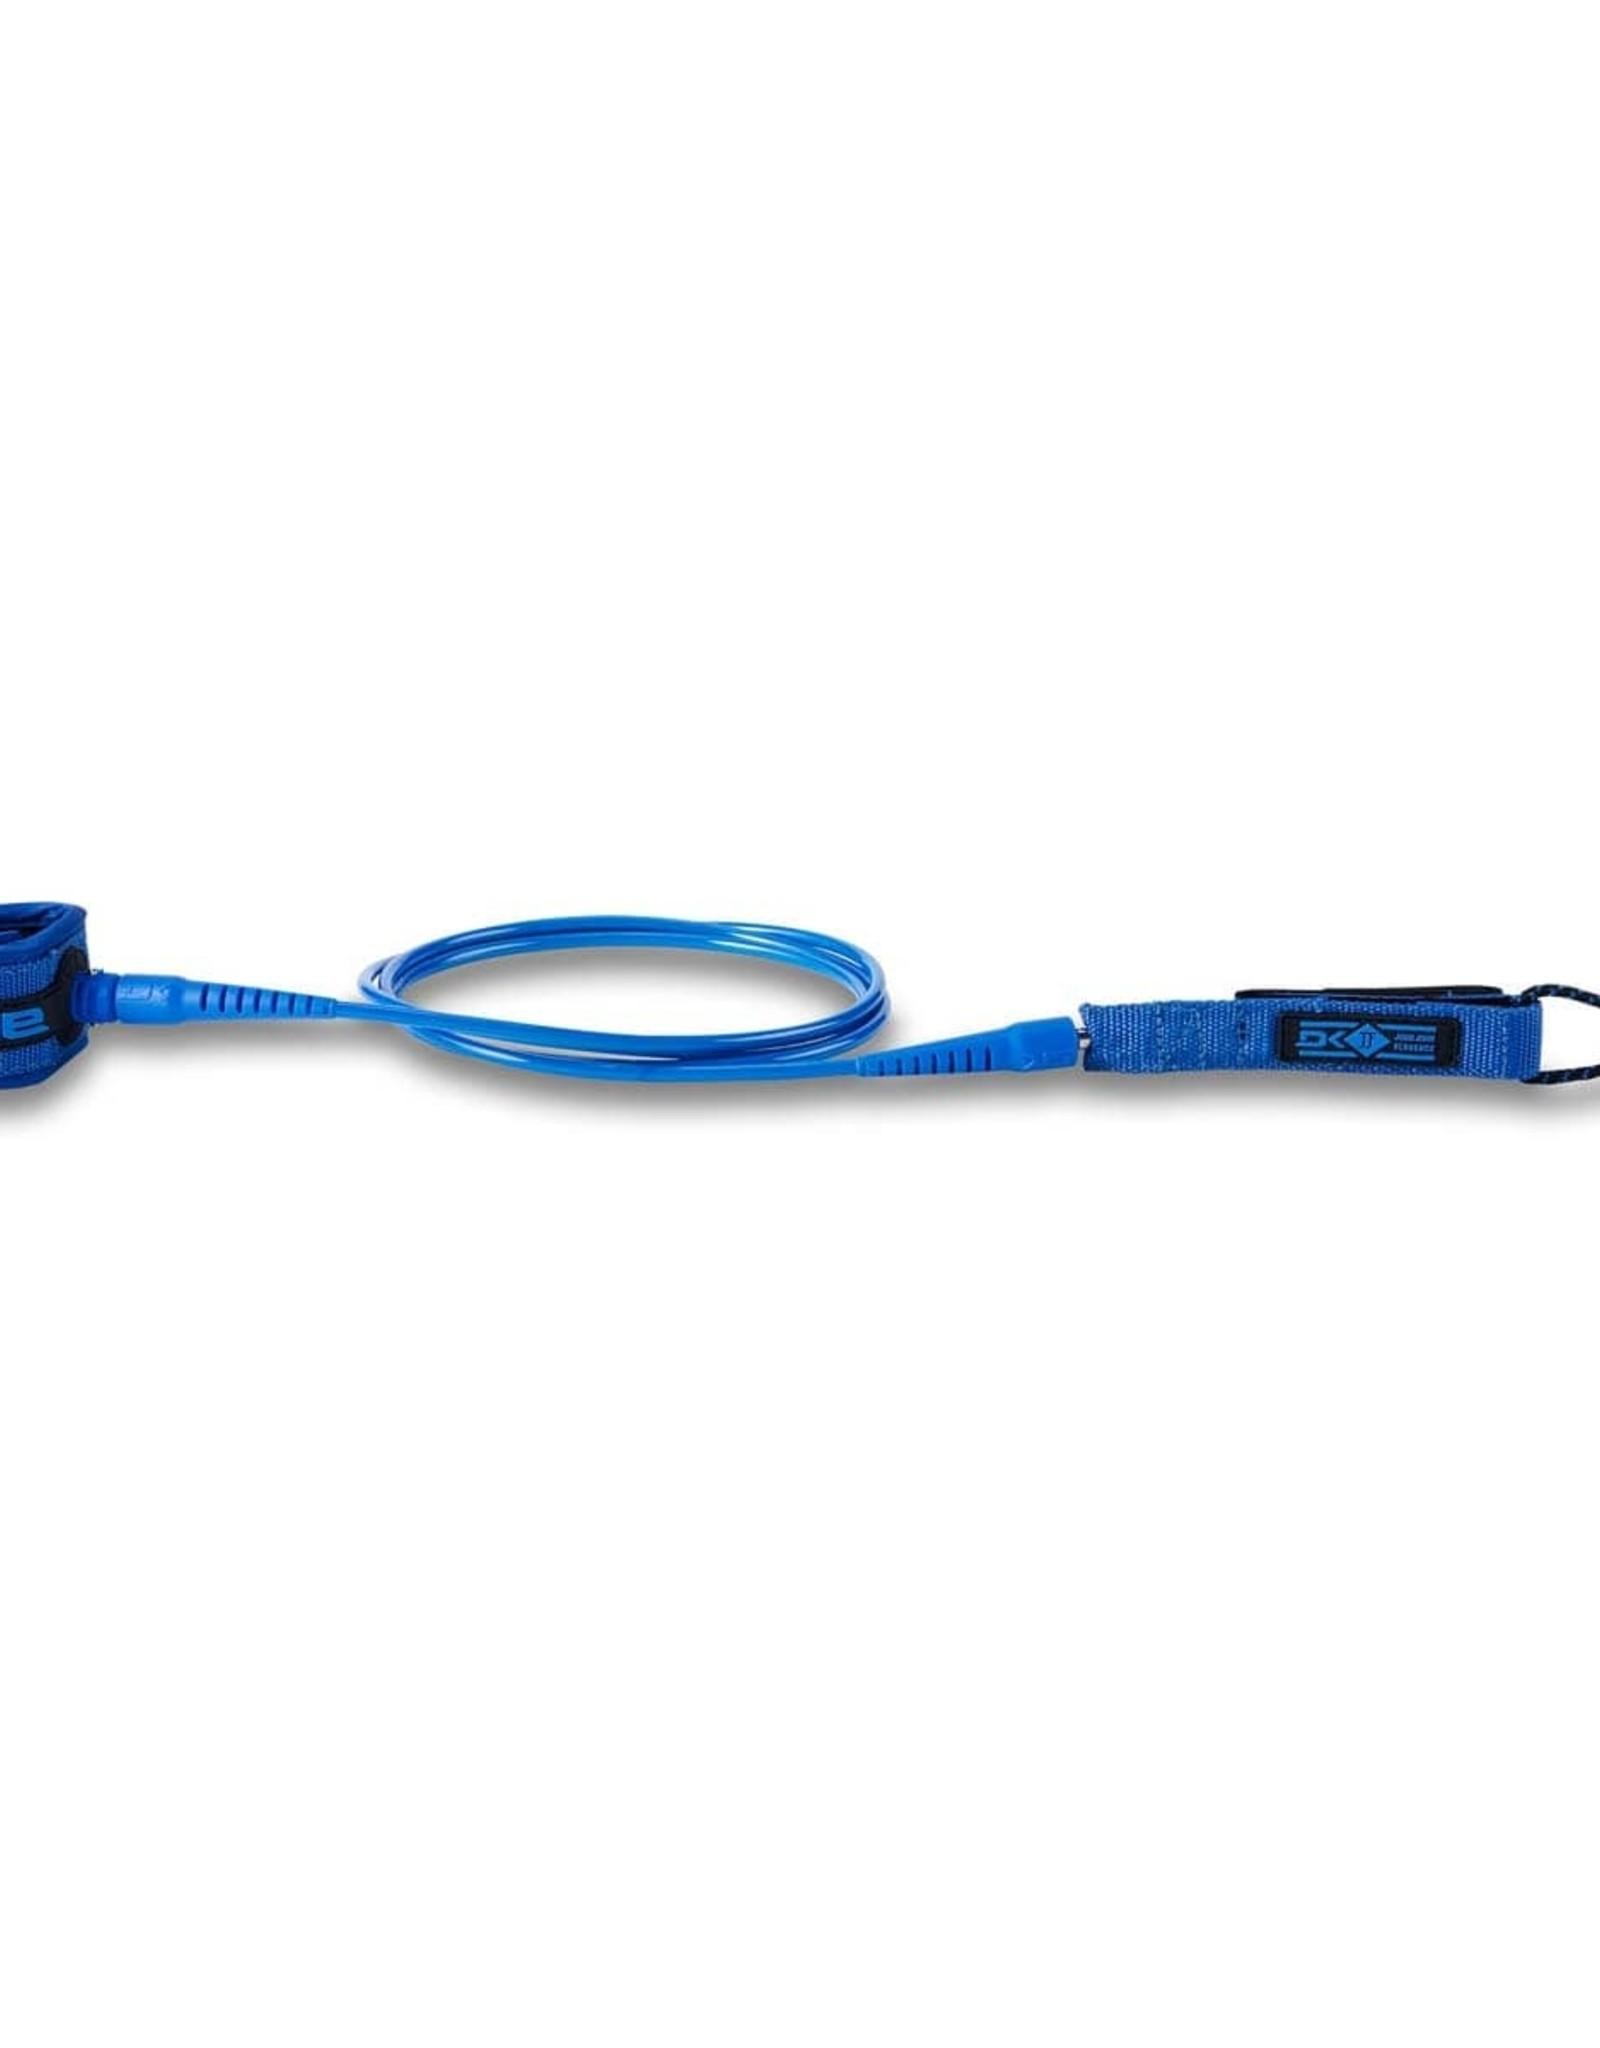 Dakine JOHN JOHN FLORENCE COMP 6'' X 3/16 Black/Blue